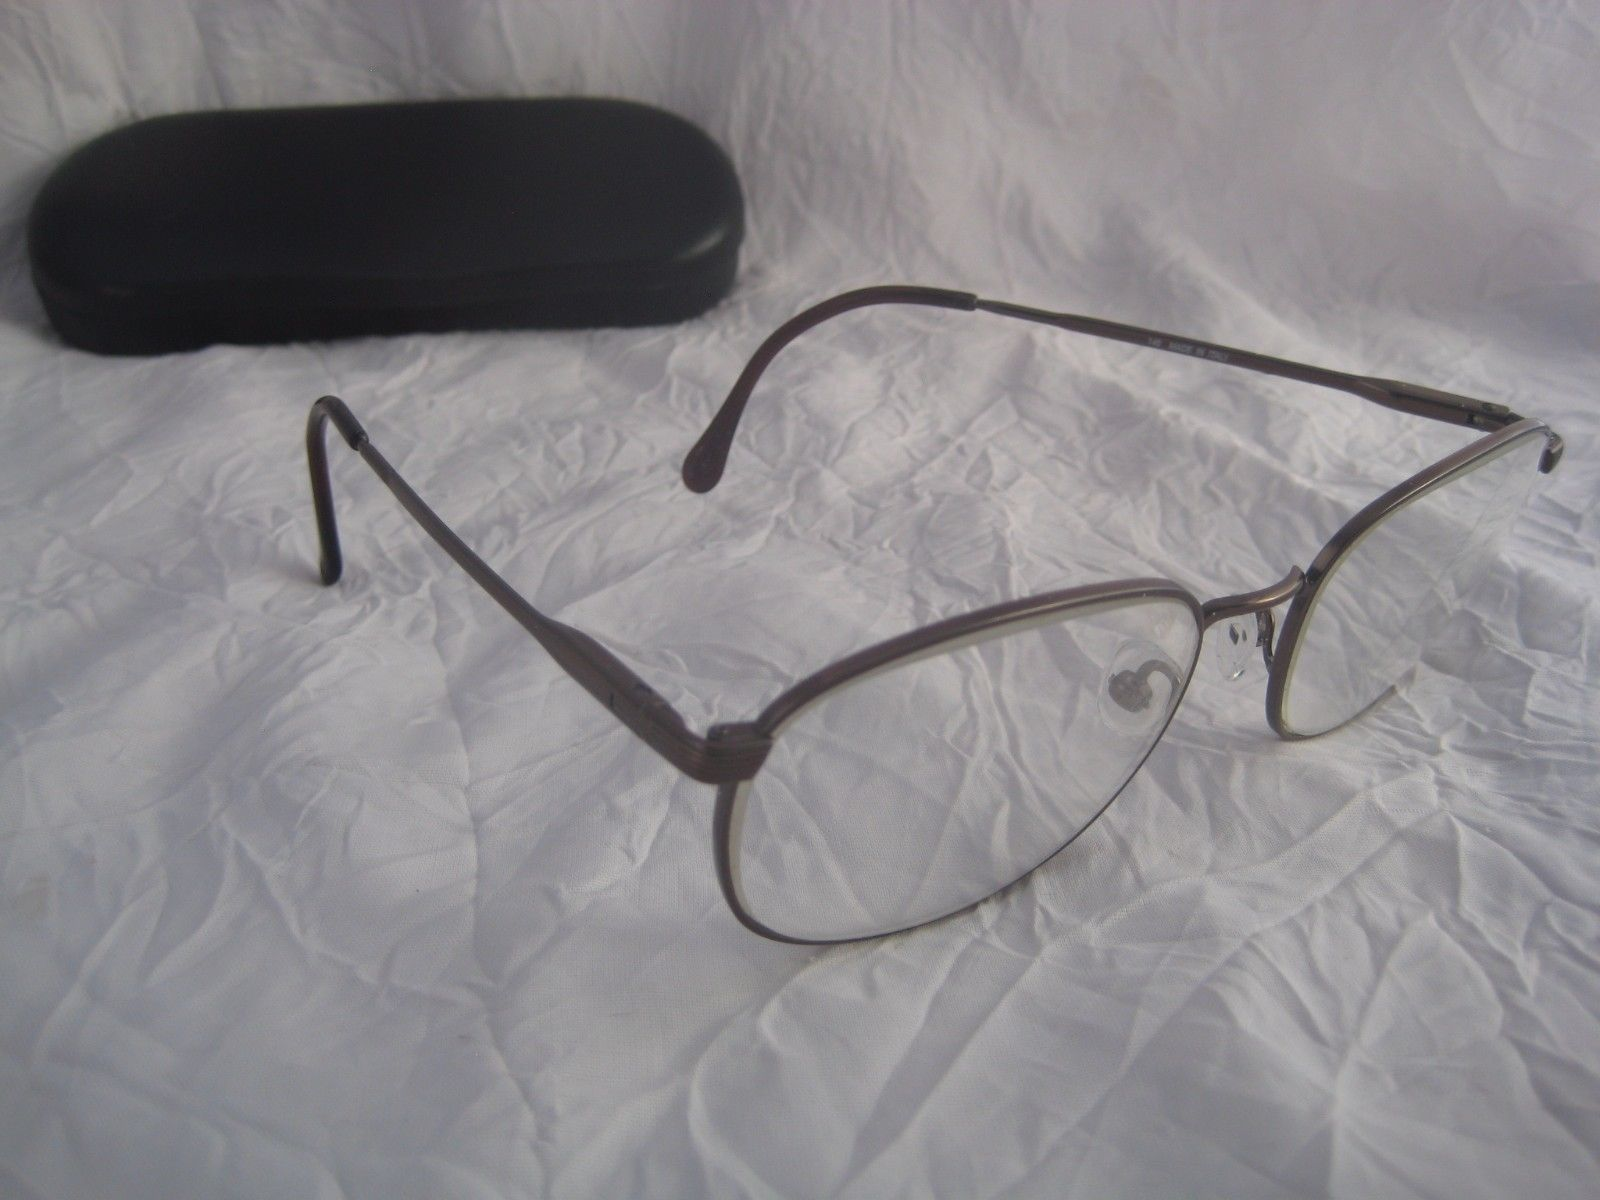 Sferoflex Eyeglass Frame: 4 listings